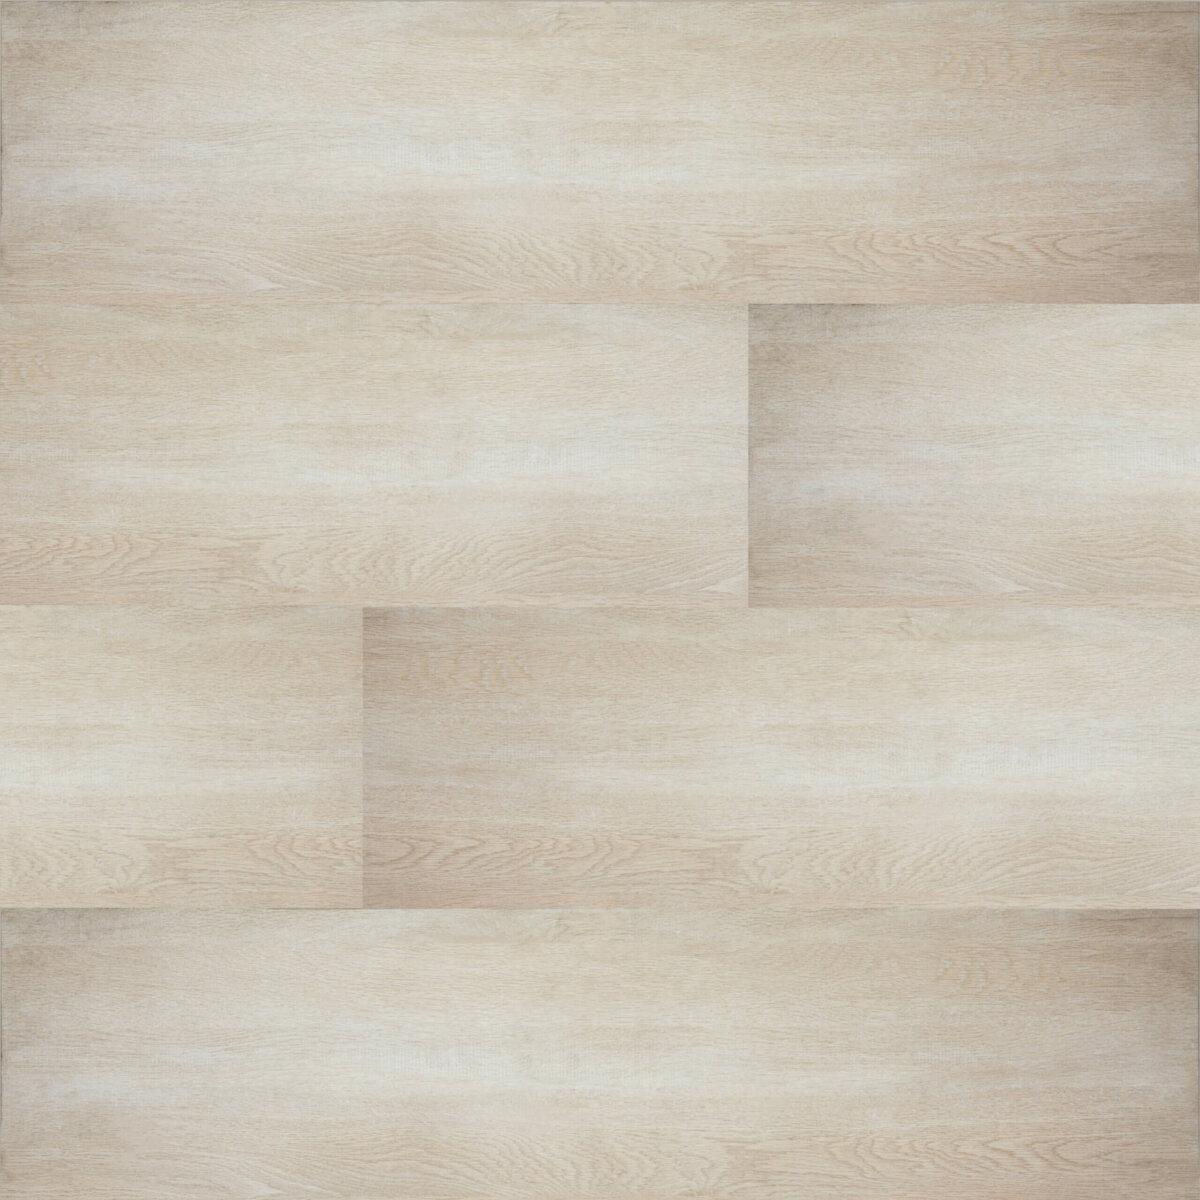 2cm-Pavers-TRAIL-Ivory-PAVER-30X120_square-product